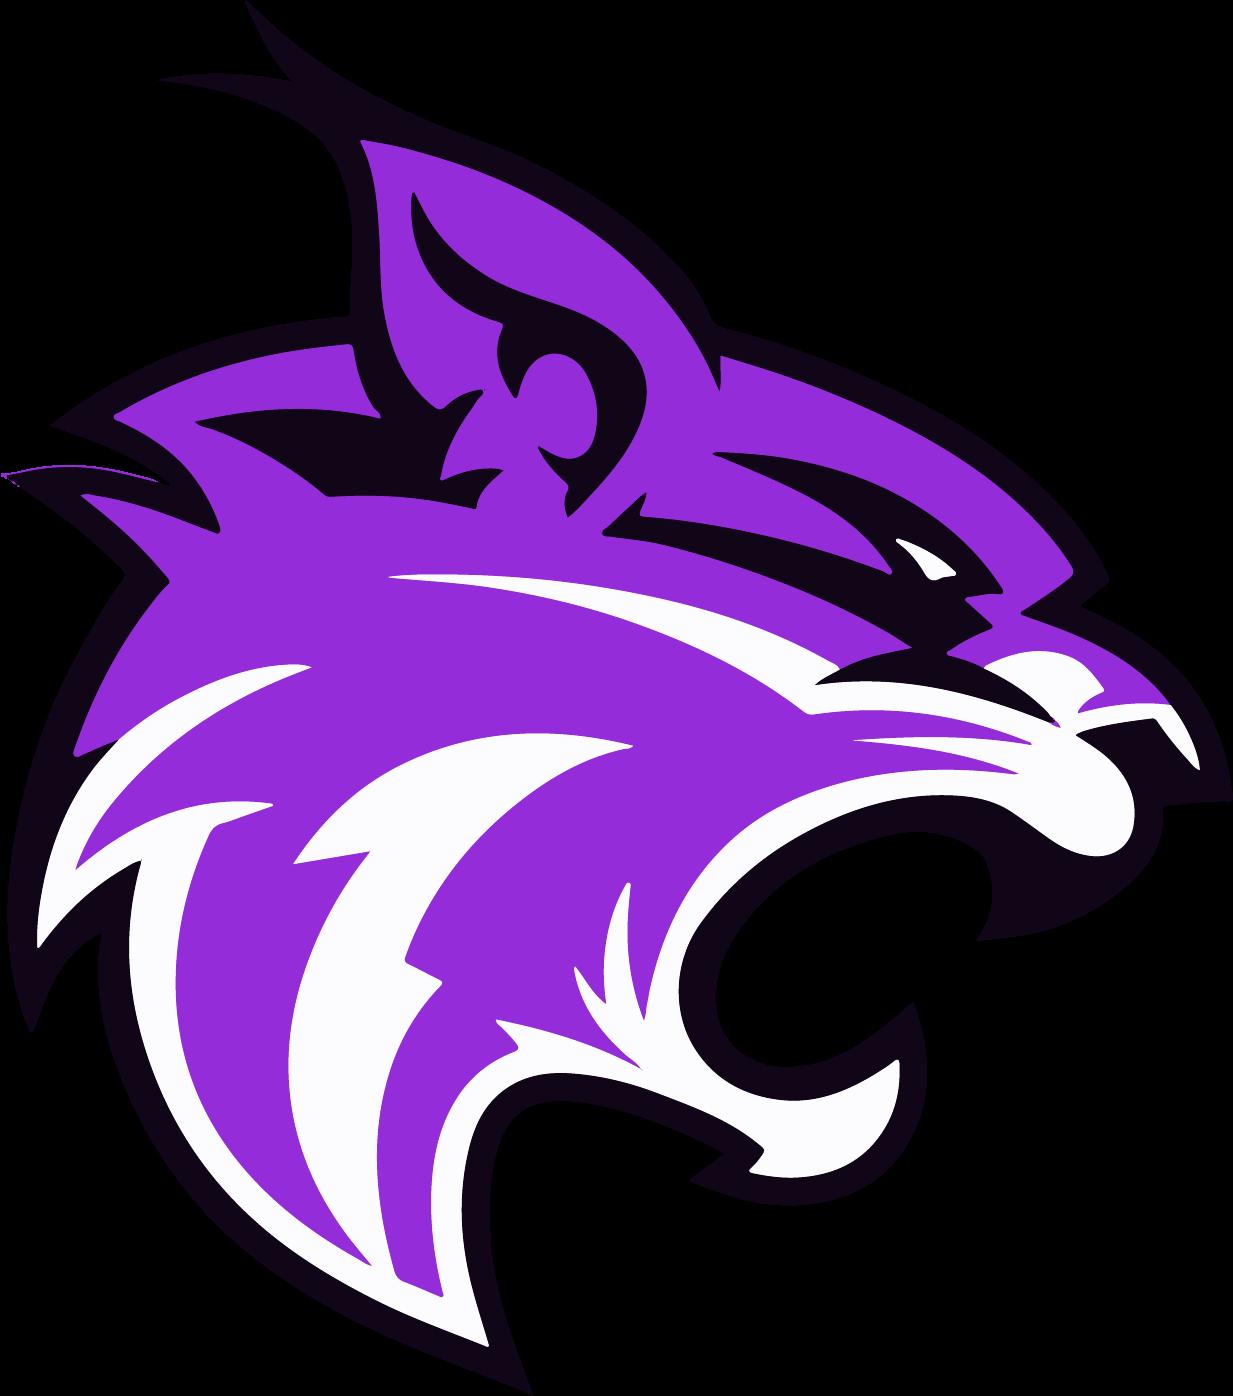 Transparent high school students clipart - Clear Creek Middle School - High Point Regional High School Logo